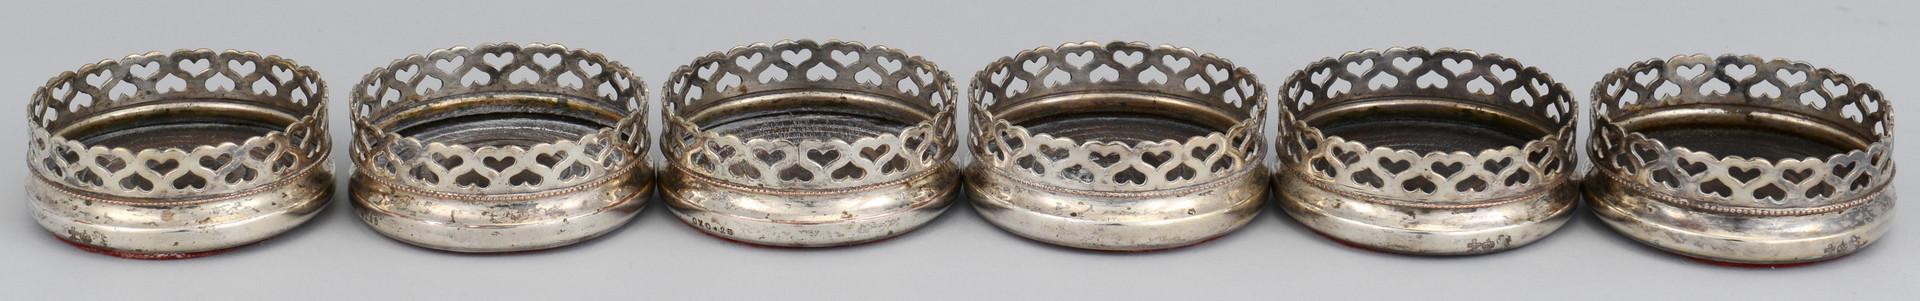 Lot 778: 22 decorative items inc. trays, silverplate